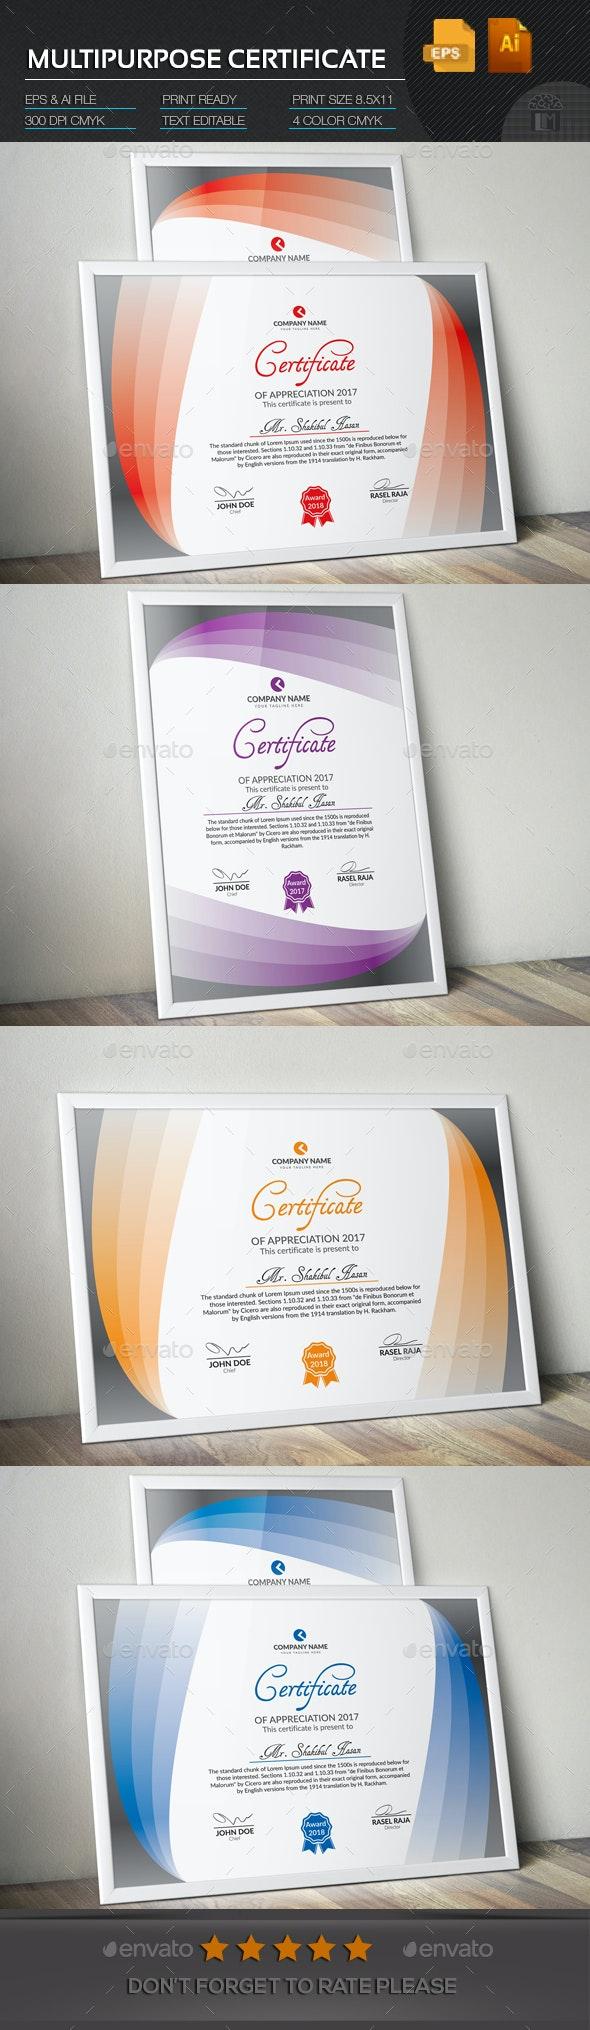 Multipurpose Certificate - Certificates Stationery